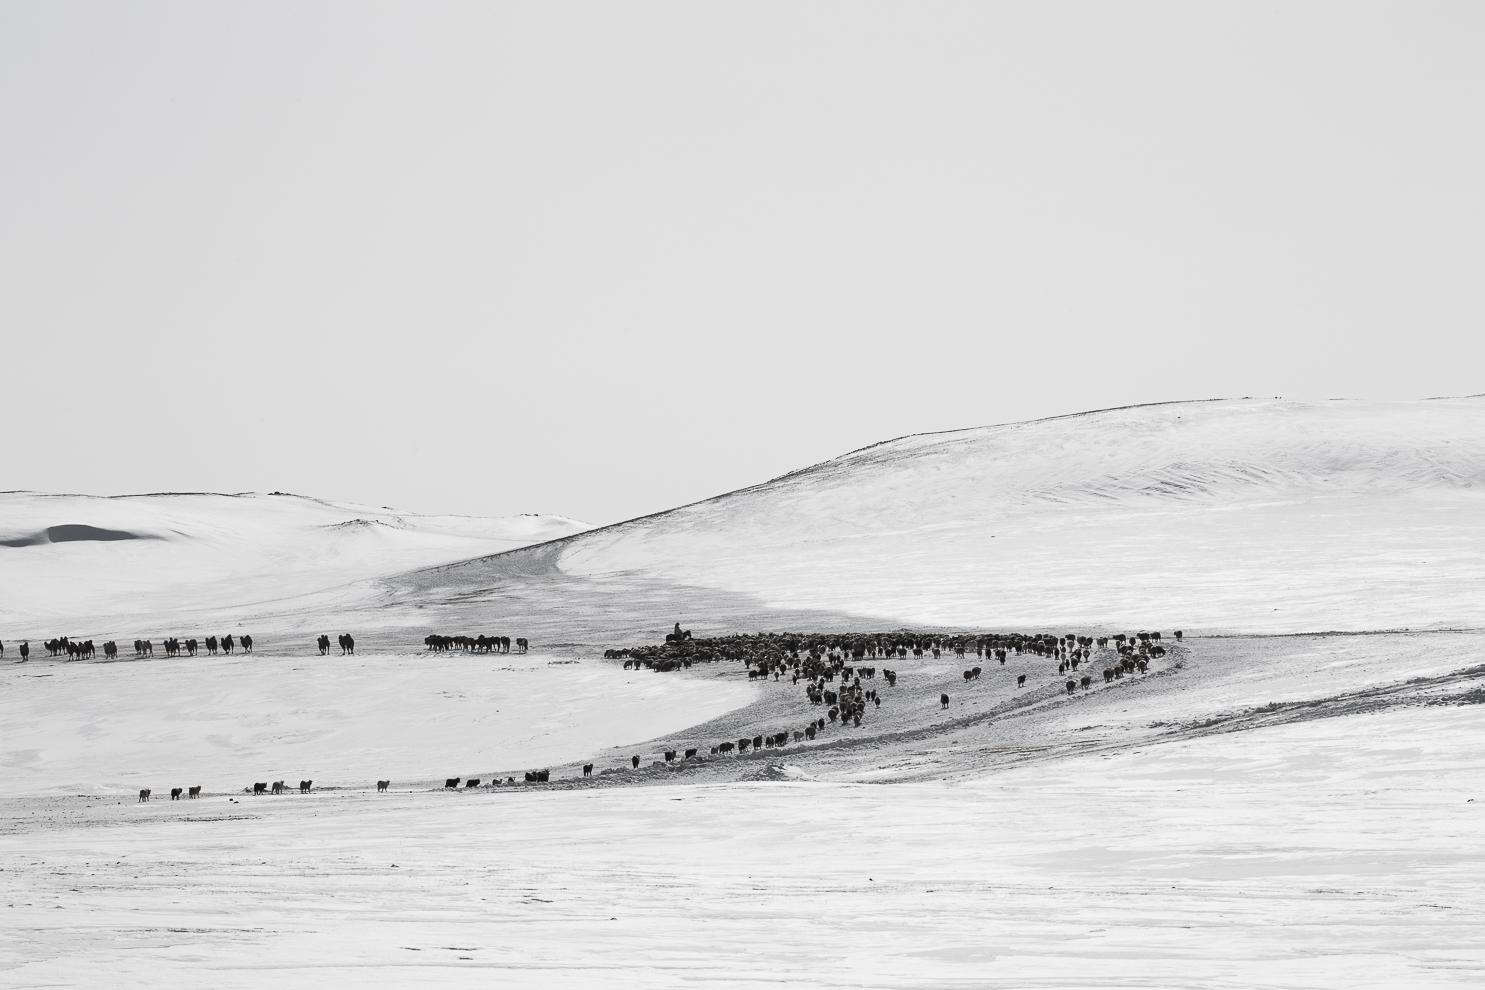 Winter Migration Mongolia